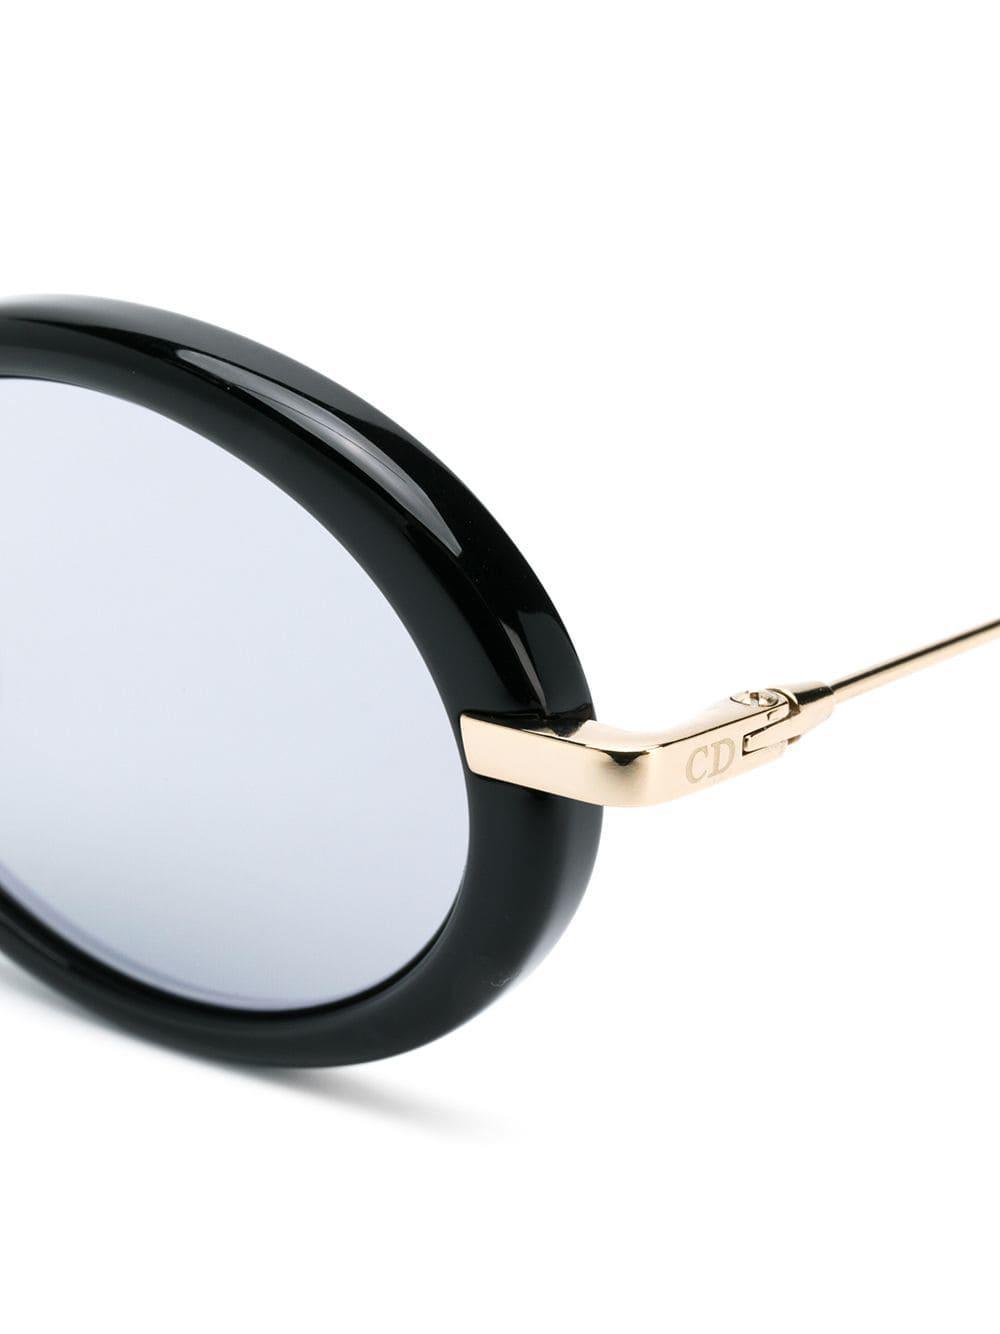 5c06f806d1f Dior Hypnotic 2 Sunglasses in Black - Lyst